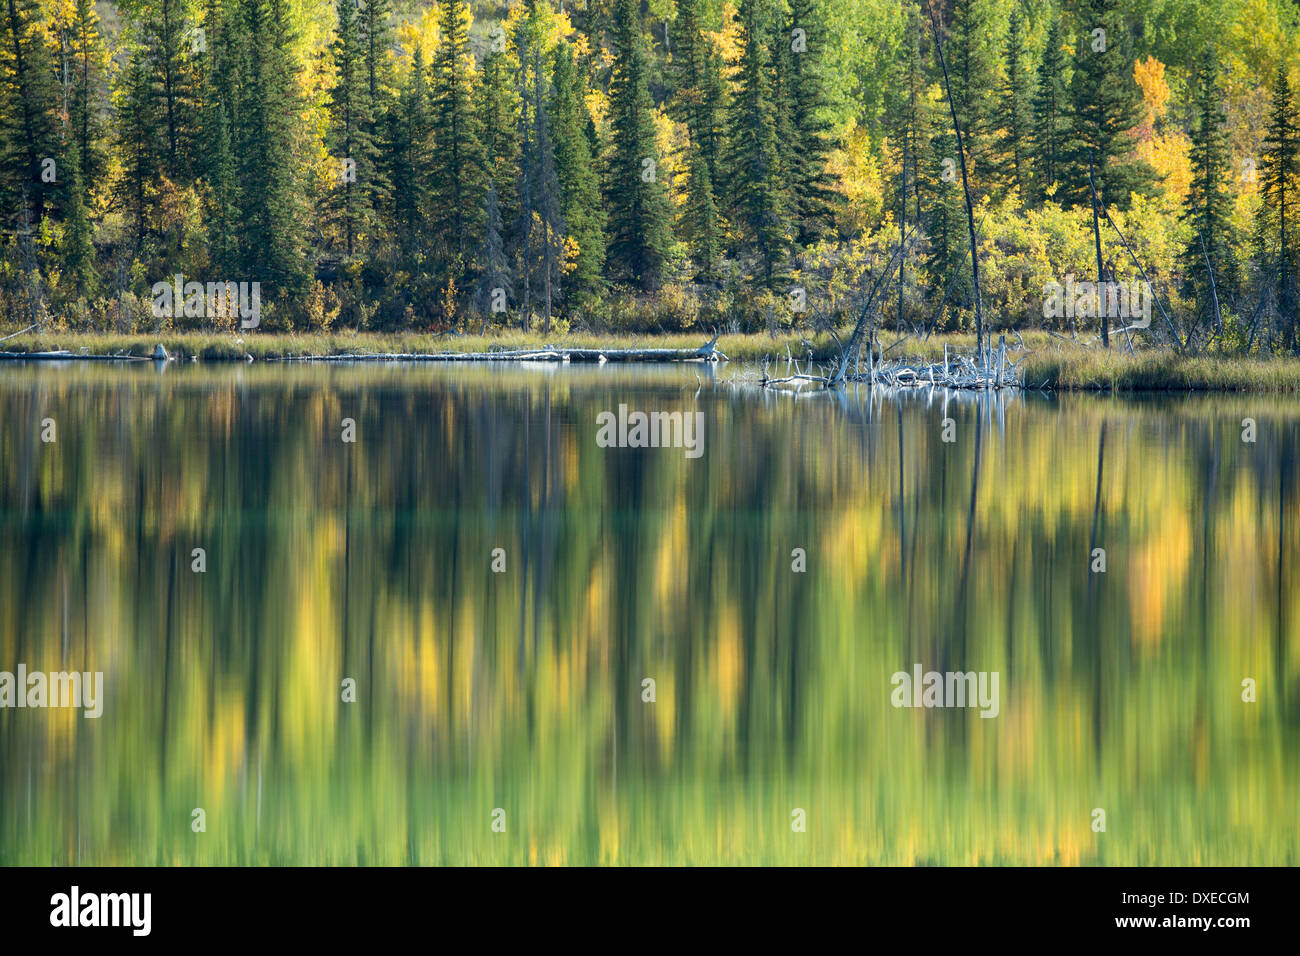 I colori autunnali nr Pelly Crossing, Yukon Territori, Canada Immagini Stock